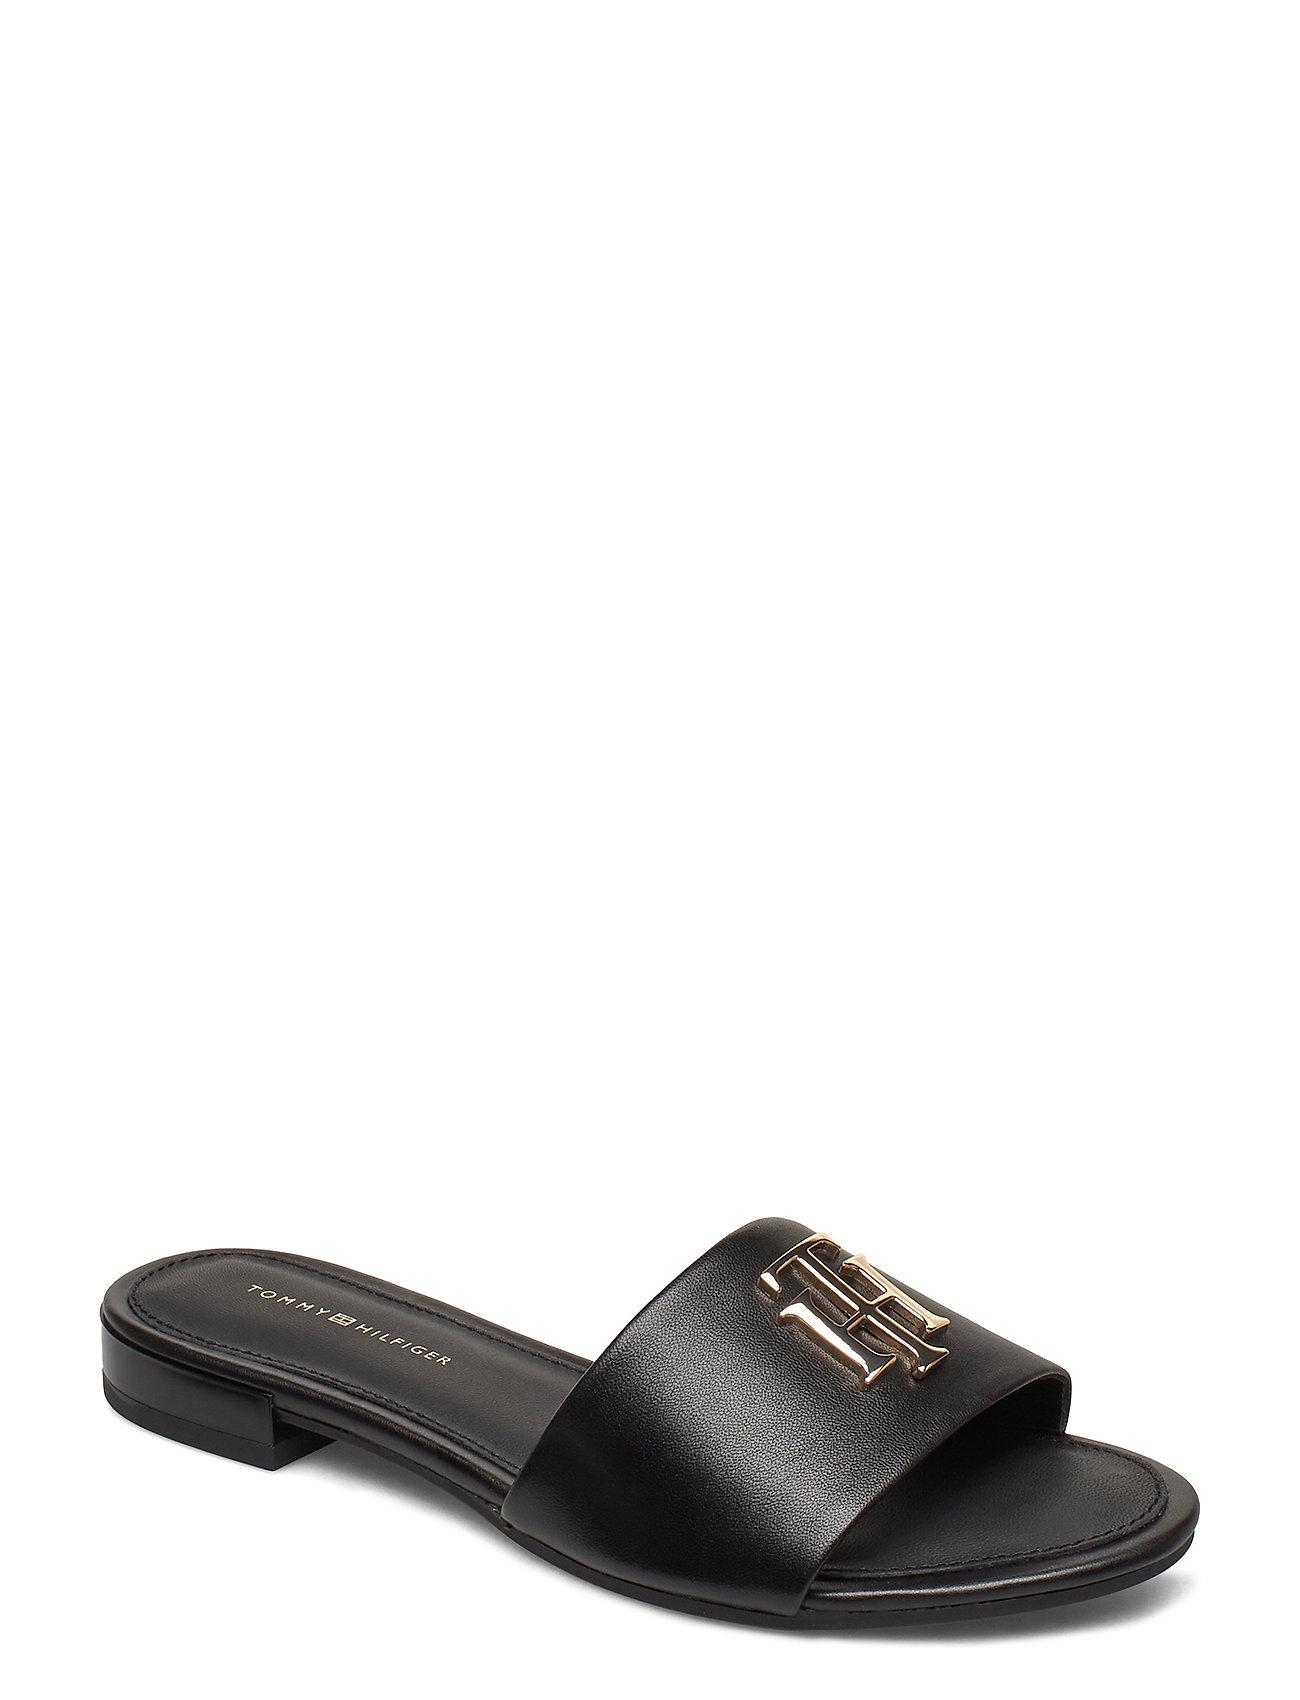 Image of Th Hardware Flat Mule Shoes Summer Shoes Flat Sandals Sort Tommy Hilfiger (3426780609)